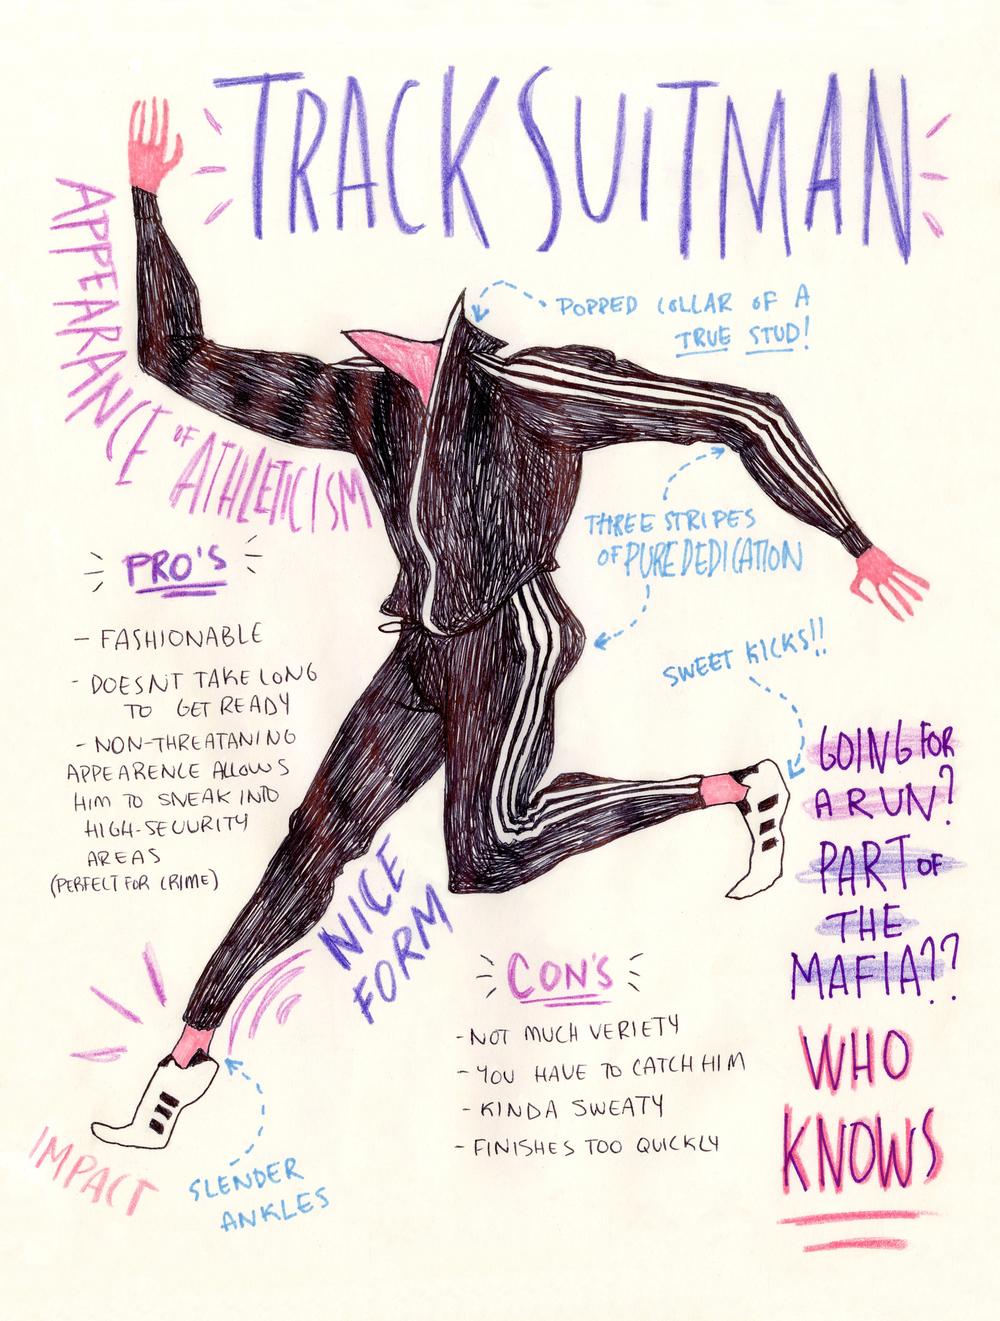 TRACK SUIT MAN.jpg